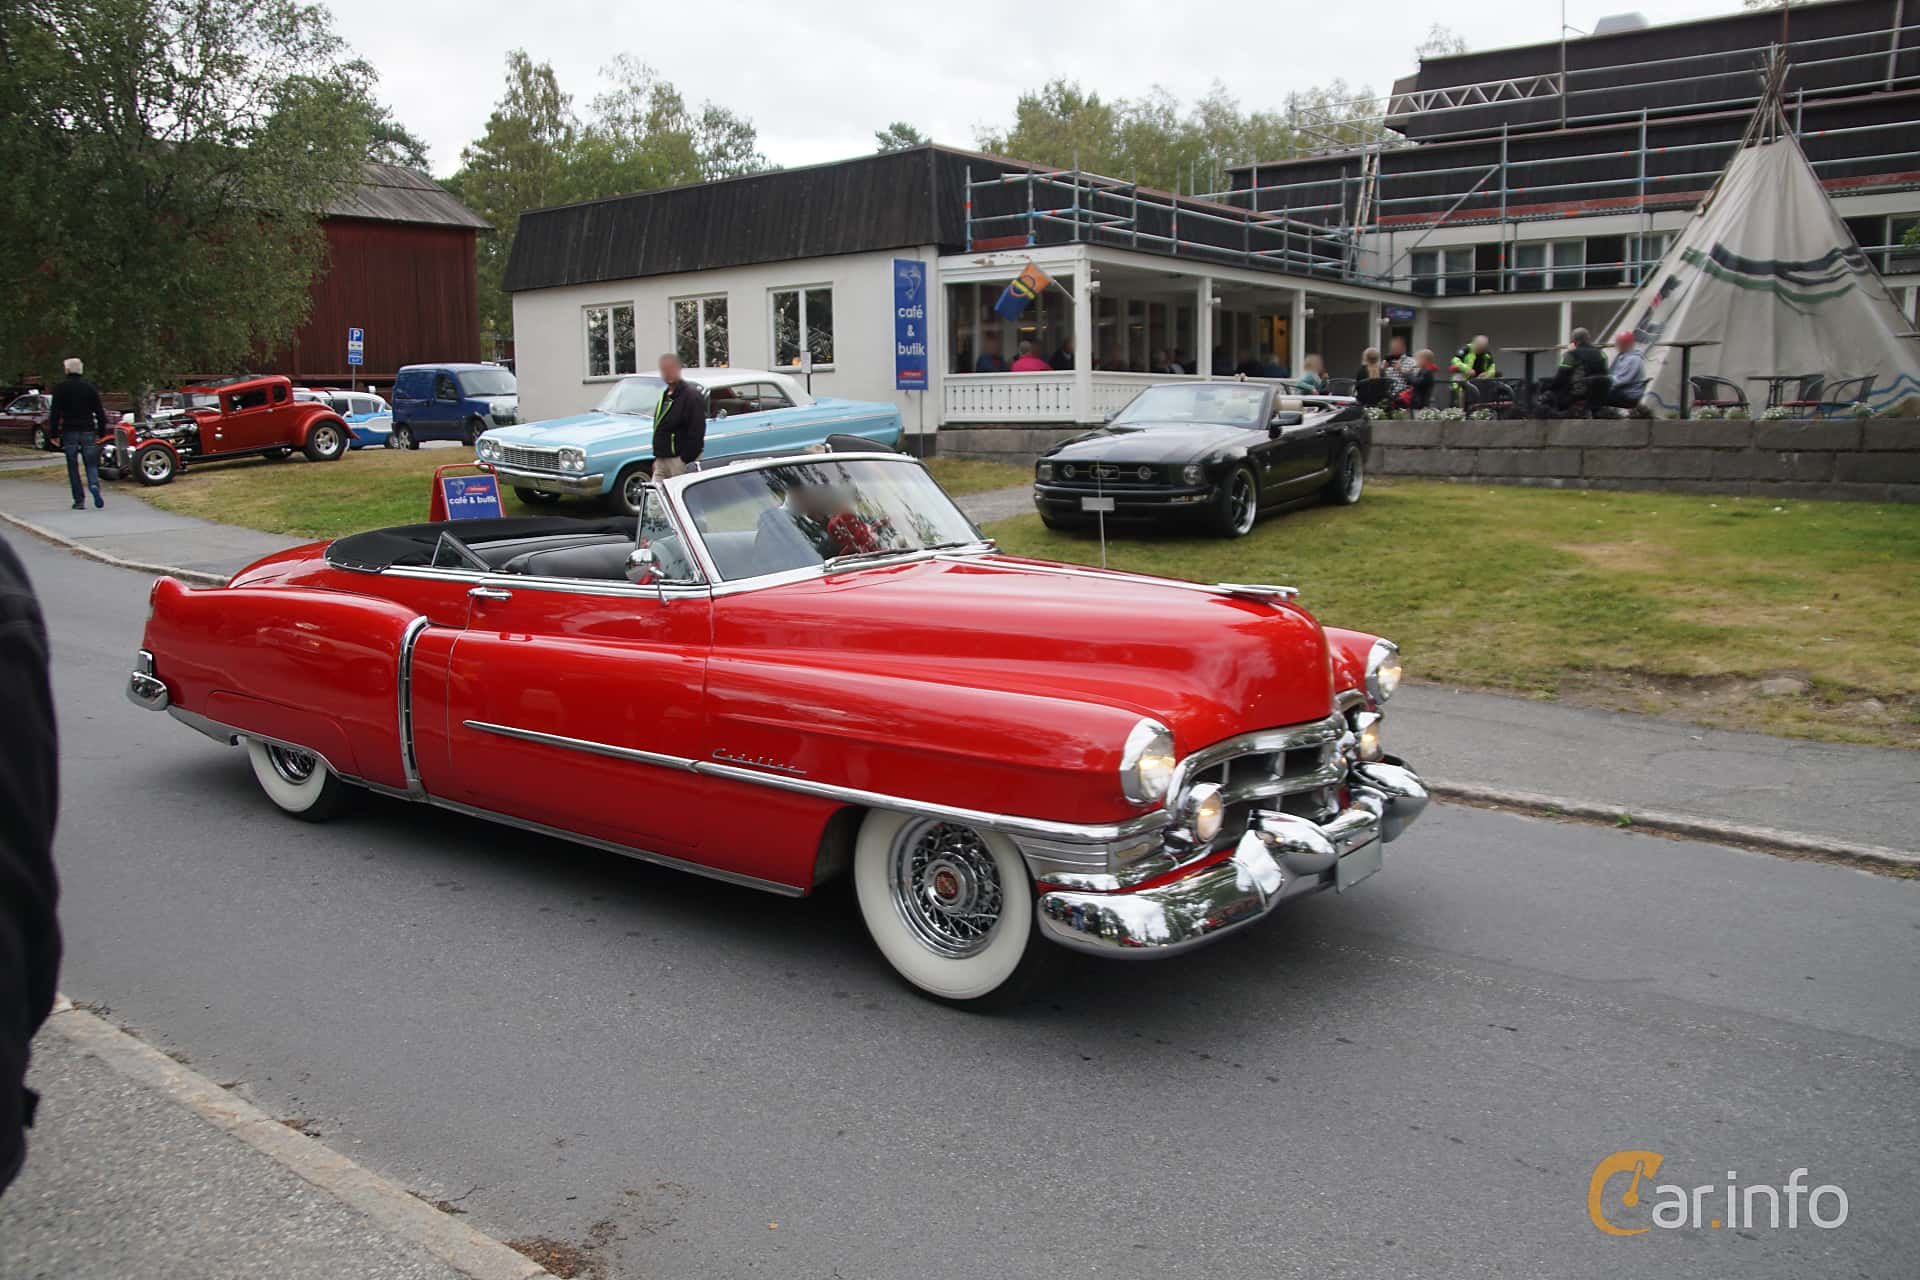 Front/Side  of Cadillac Sixty-Two Convertible 5.4 V8 Hydra-Matic, 193ps, 1952 at Onsdagsträffar på Gammlia Umeå 2019 vecka 32